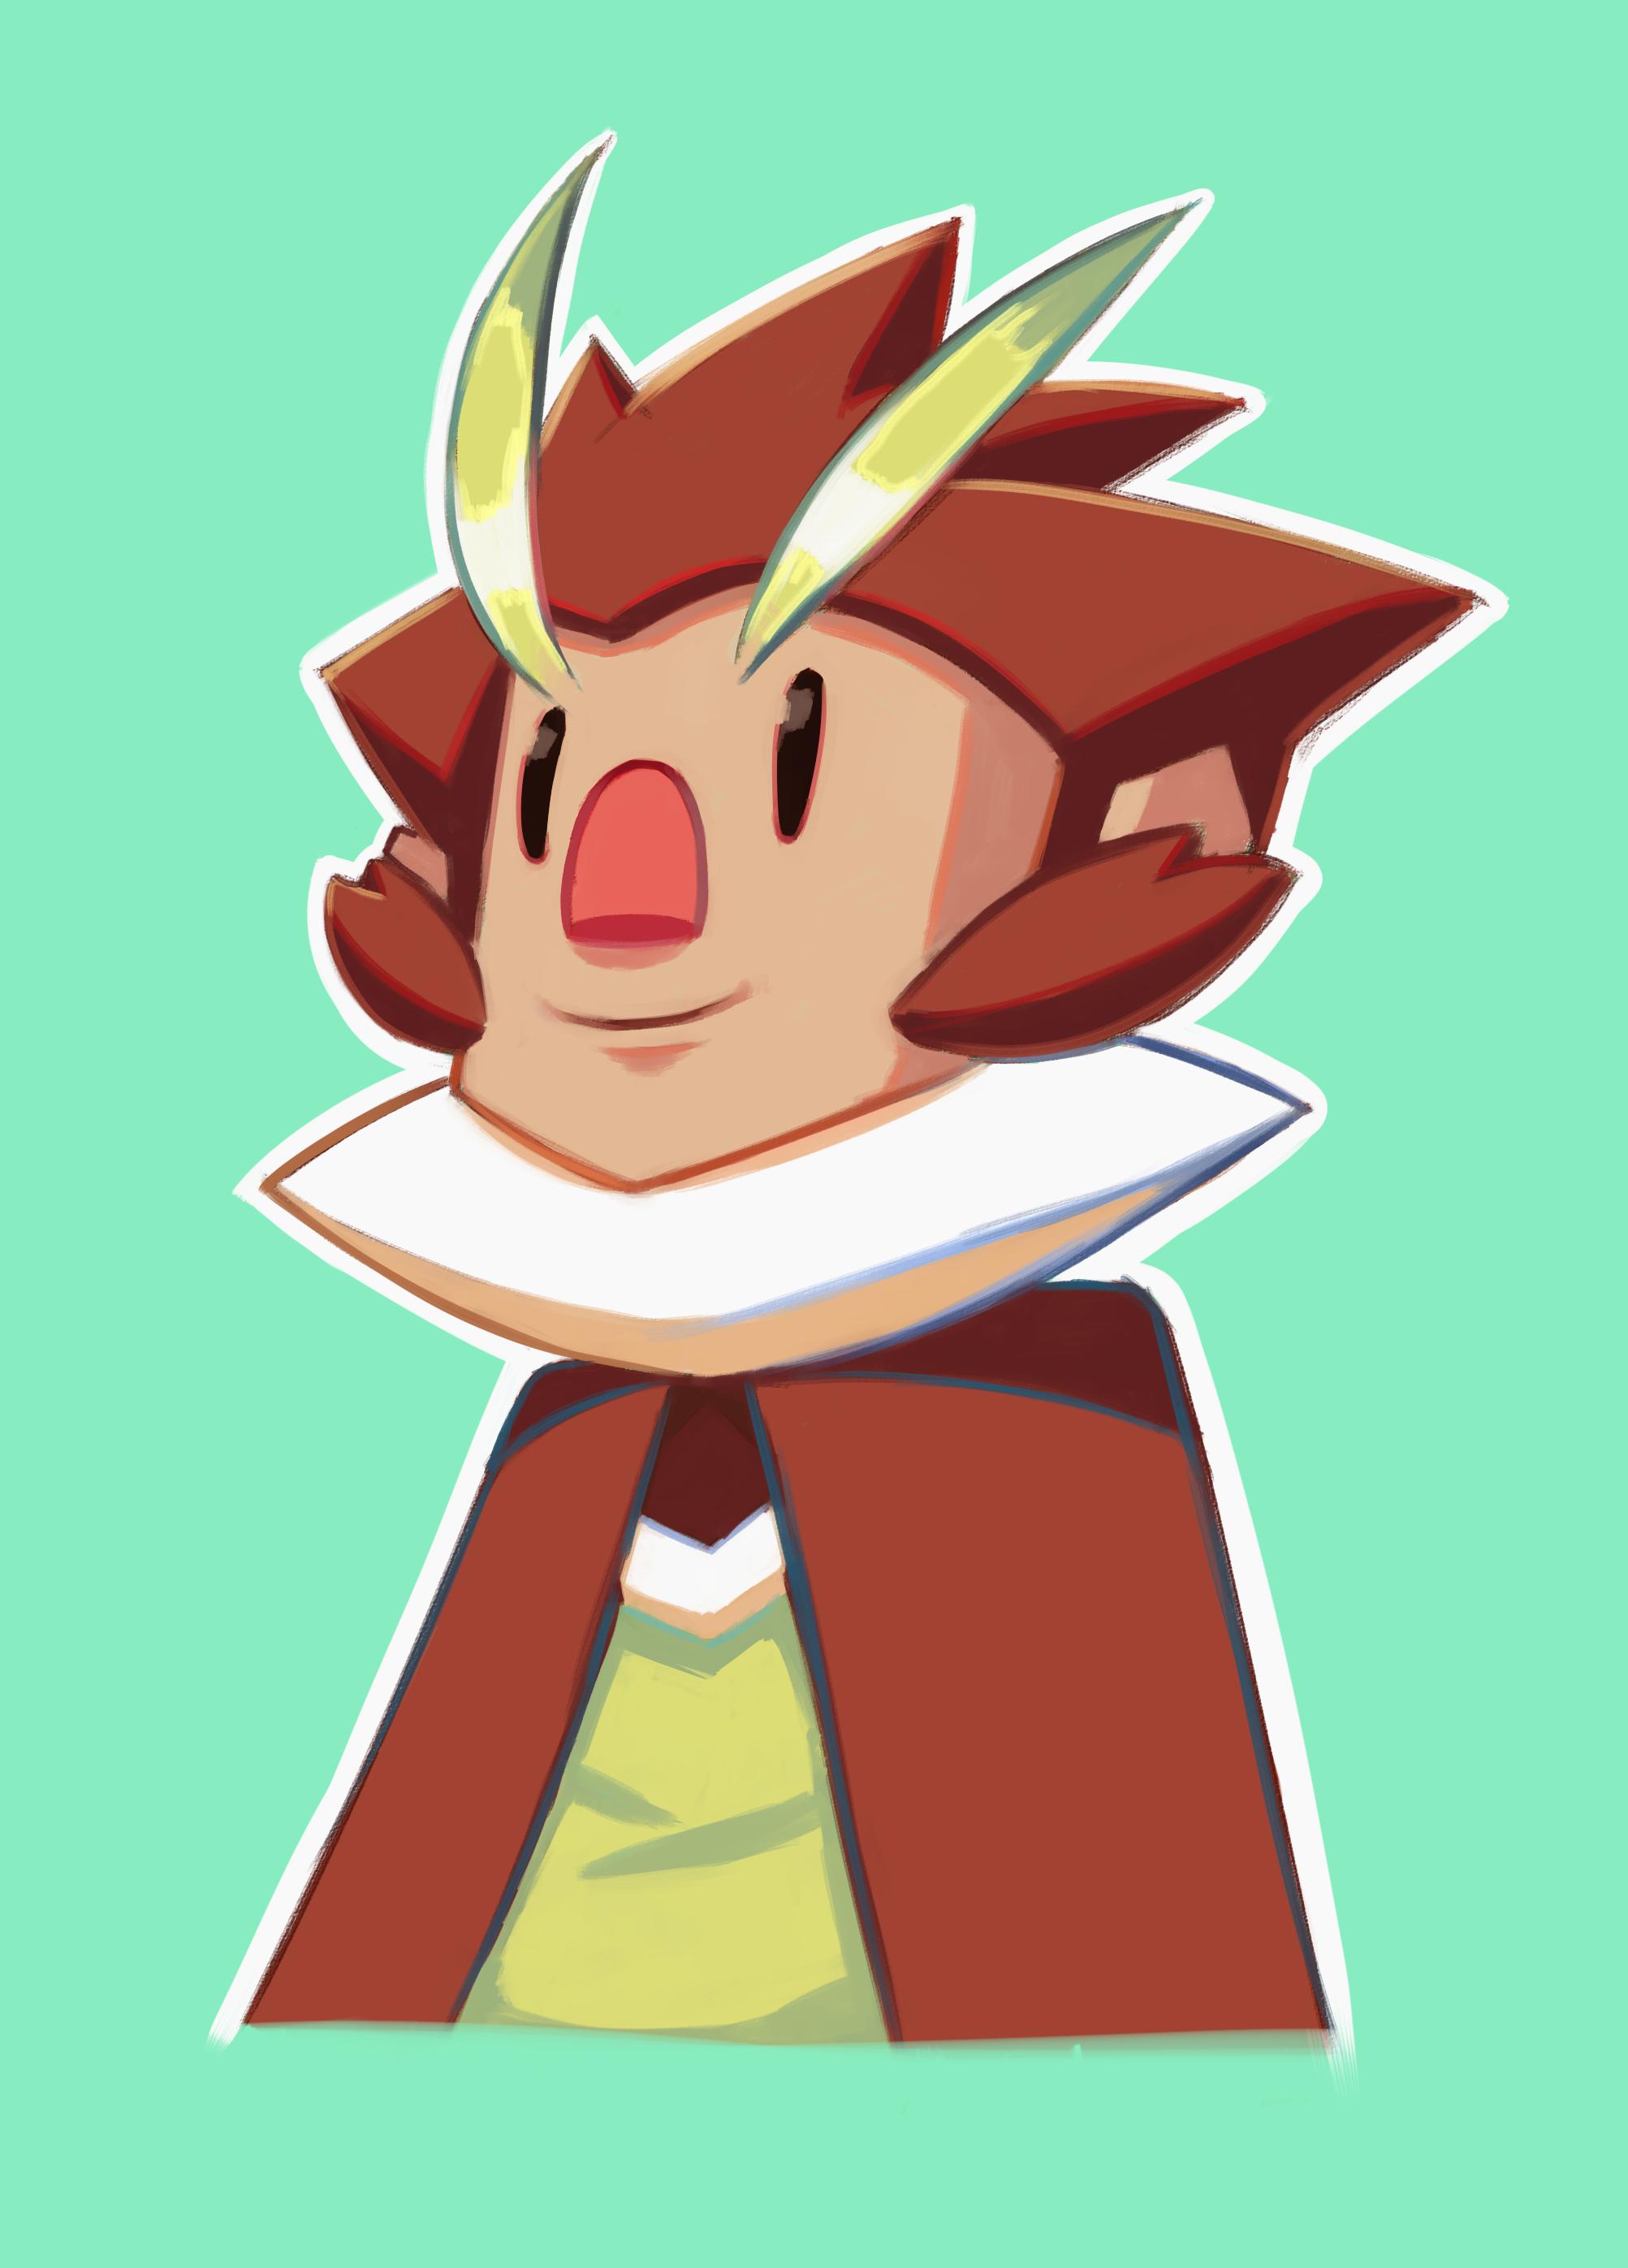 Just owlboy